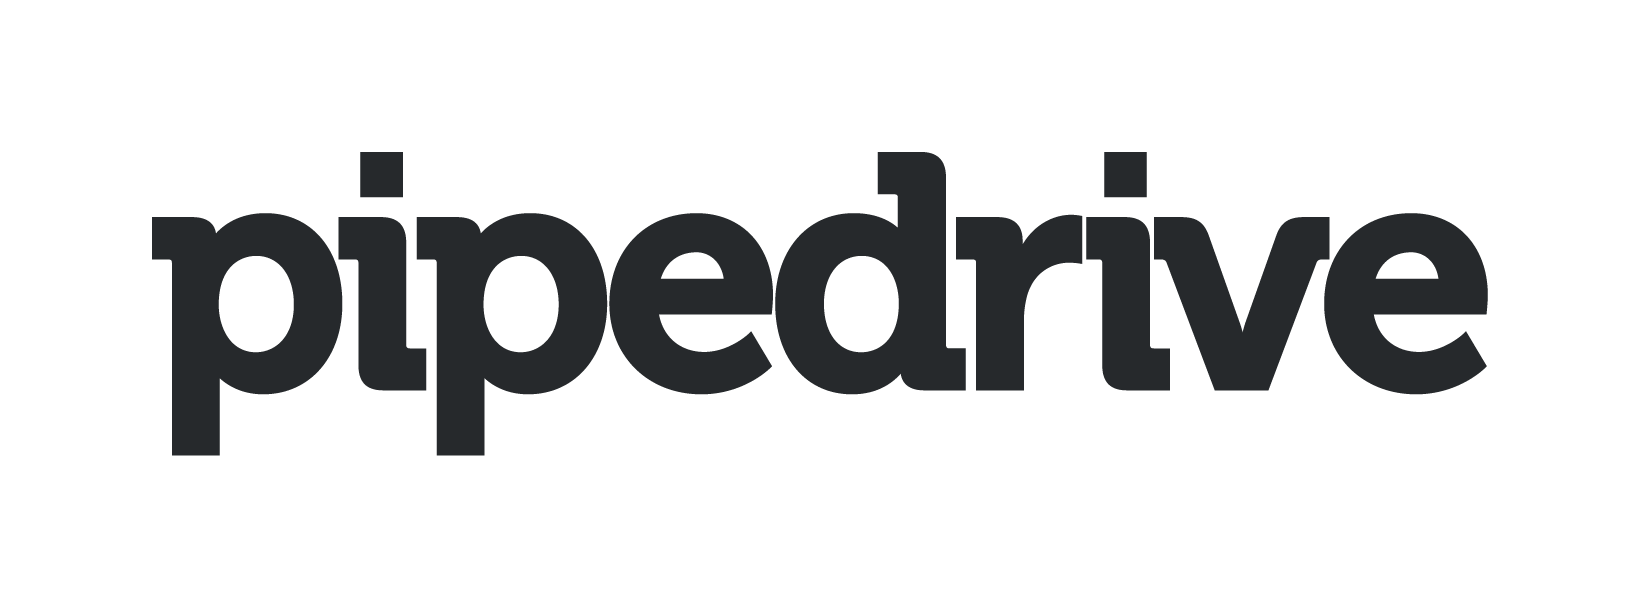 Cannabiz Media integration with pipedrive